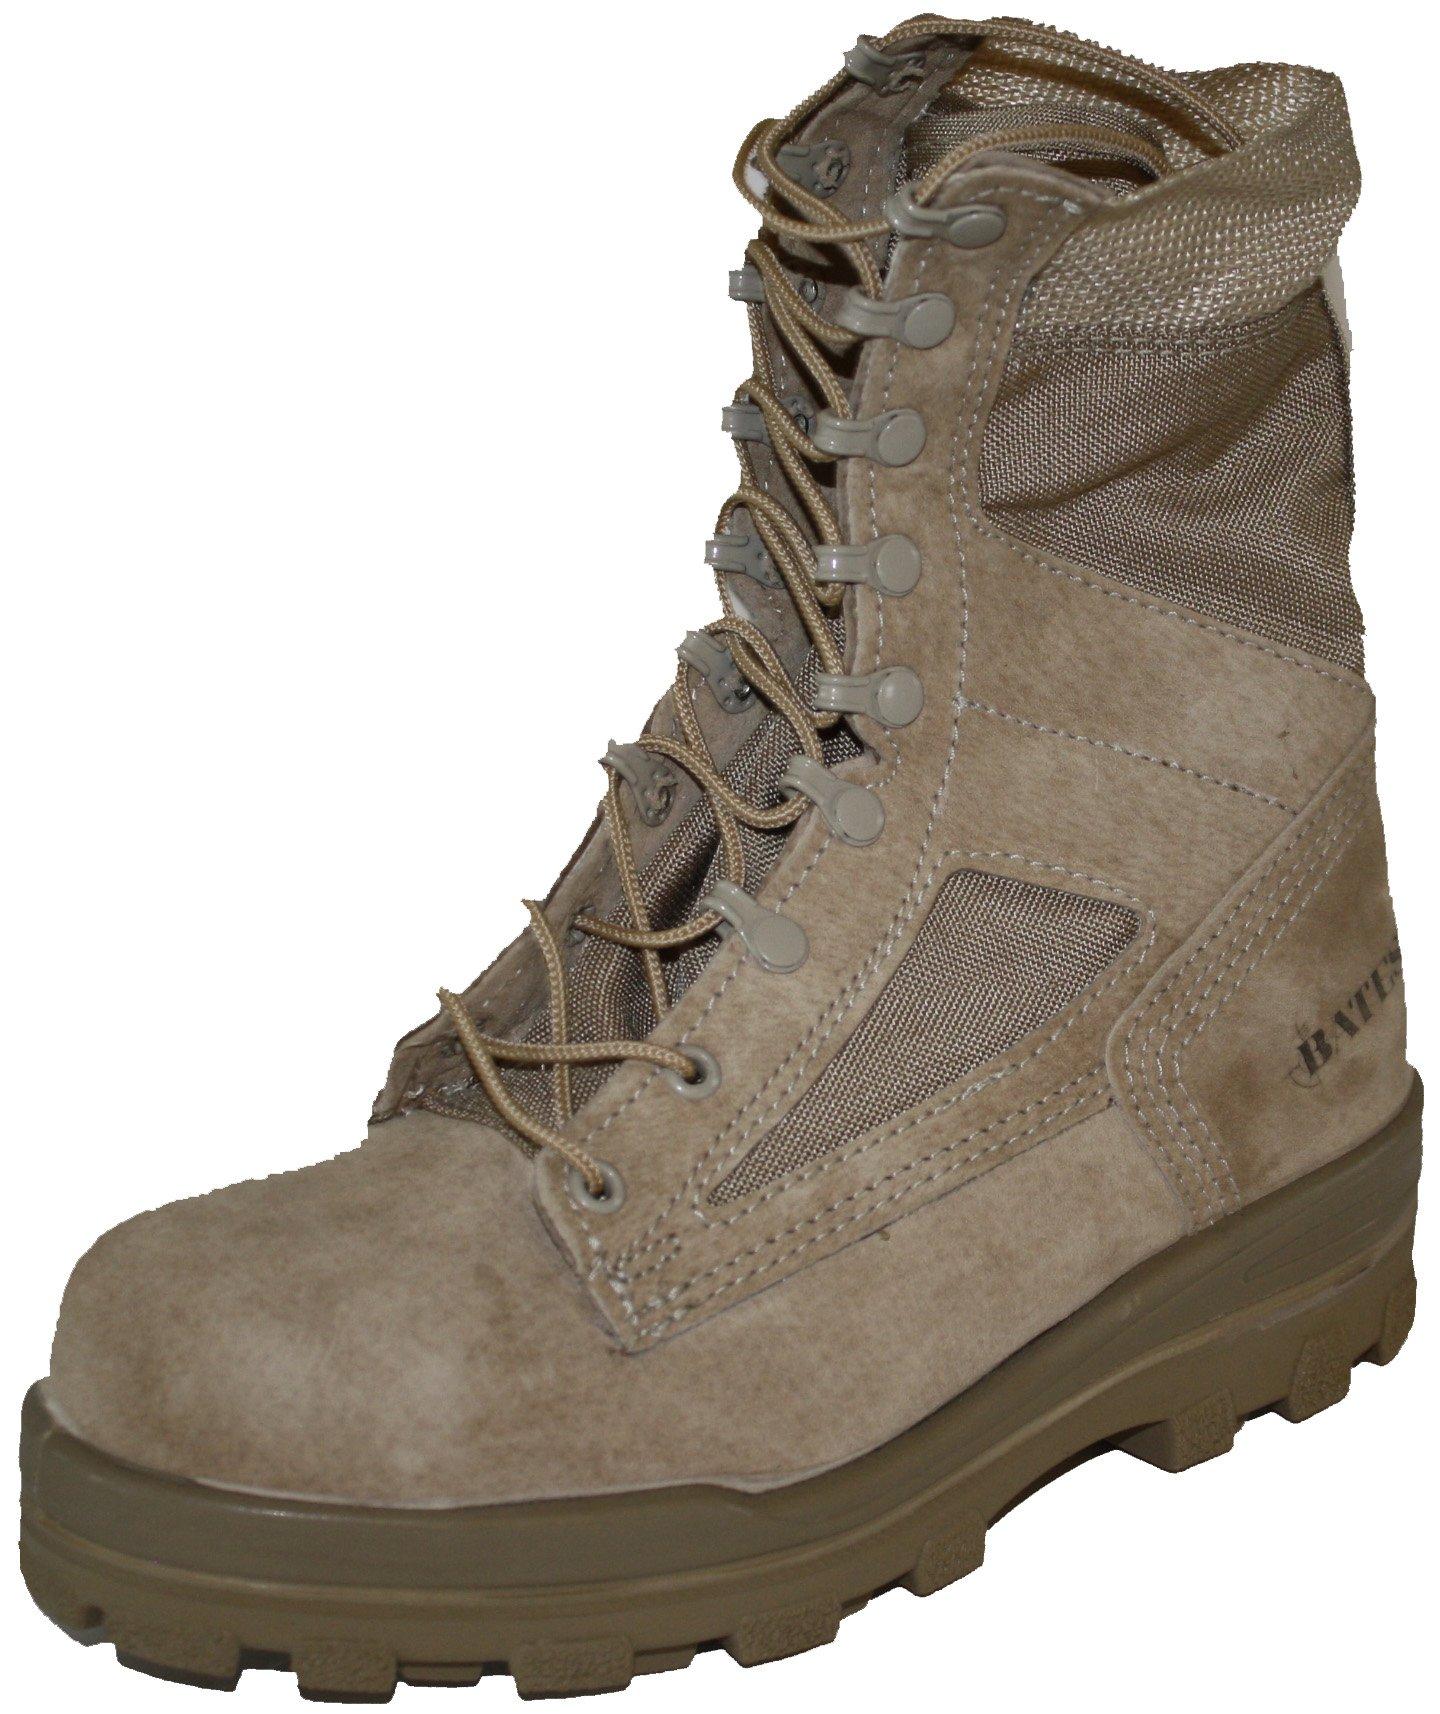 Bates Women's 8 Inches Durashocks Steel Toe Boot,Desert Sand,9.5 W US by Bates